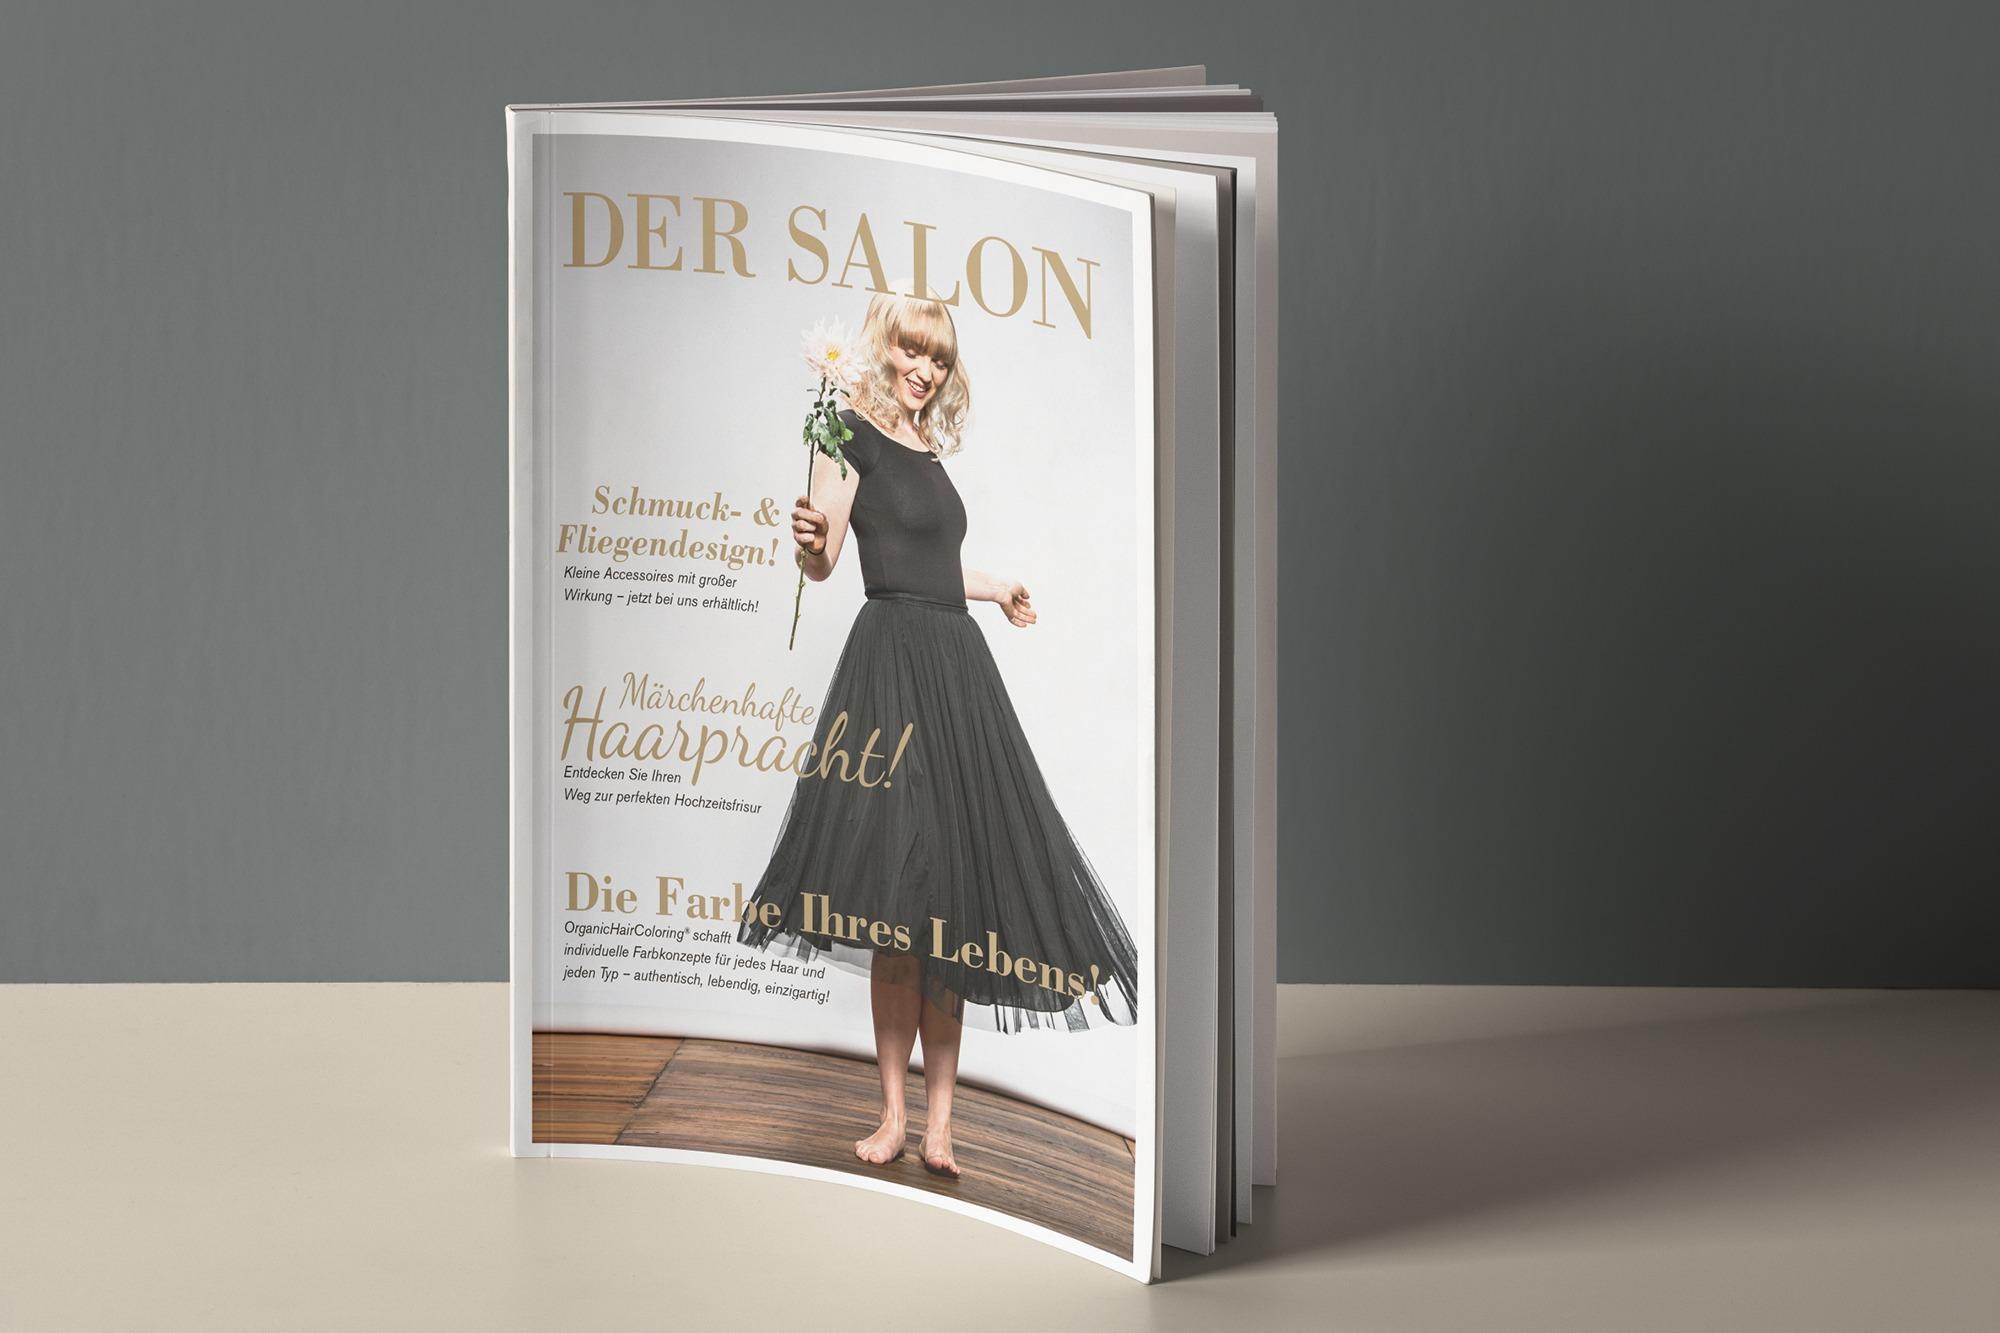 Studio dos, Grafikdesign Osnabrück, Der Salon Magazin Cover